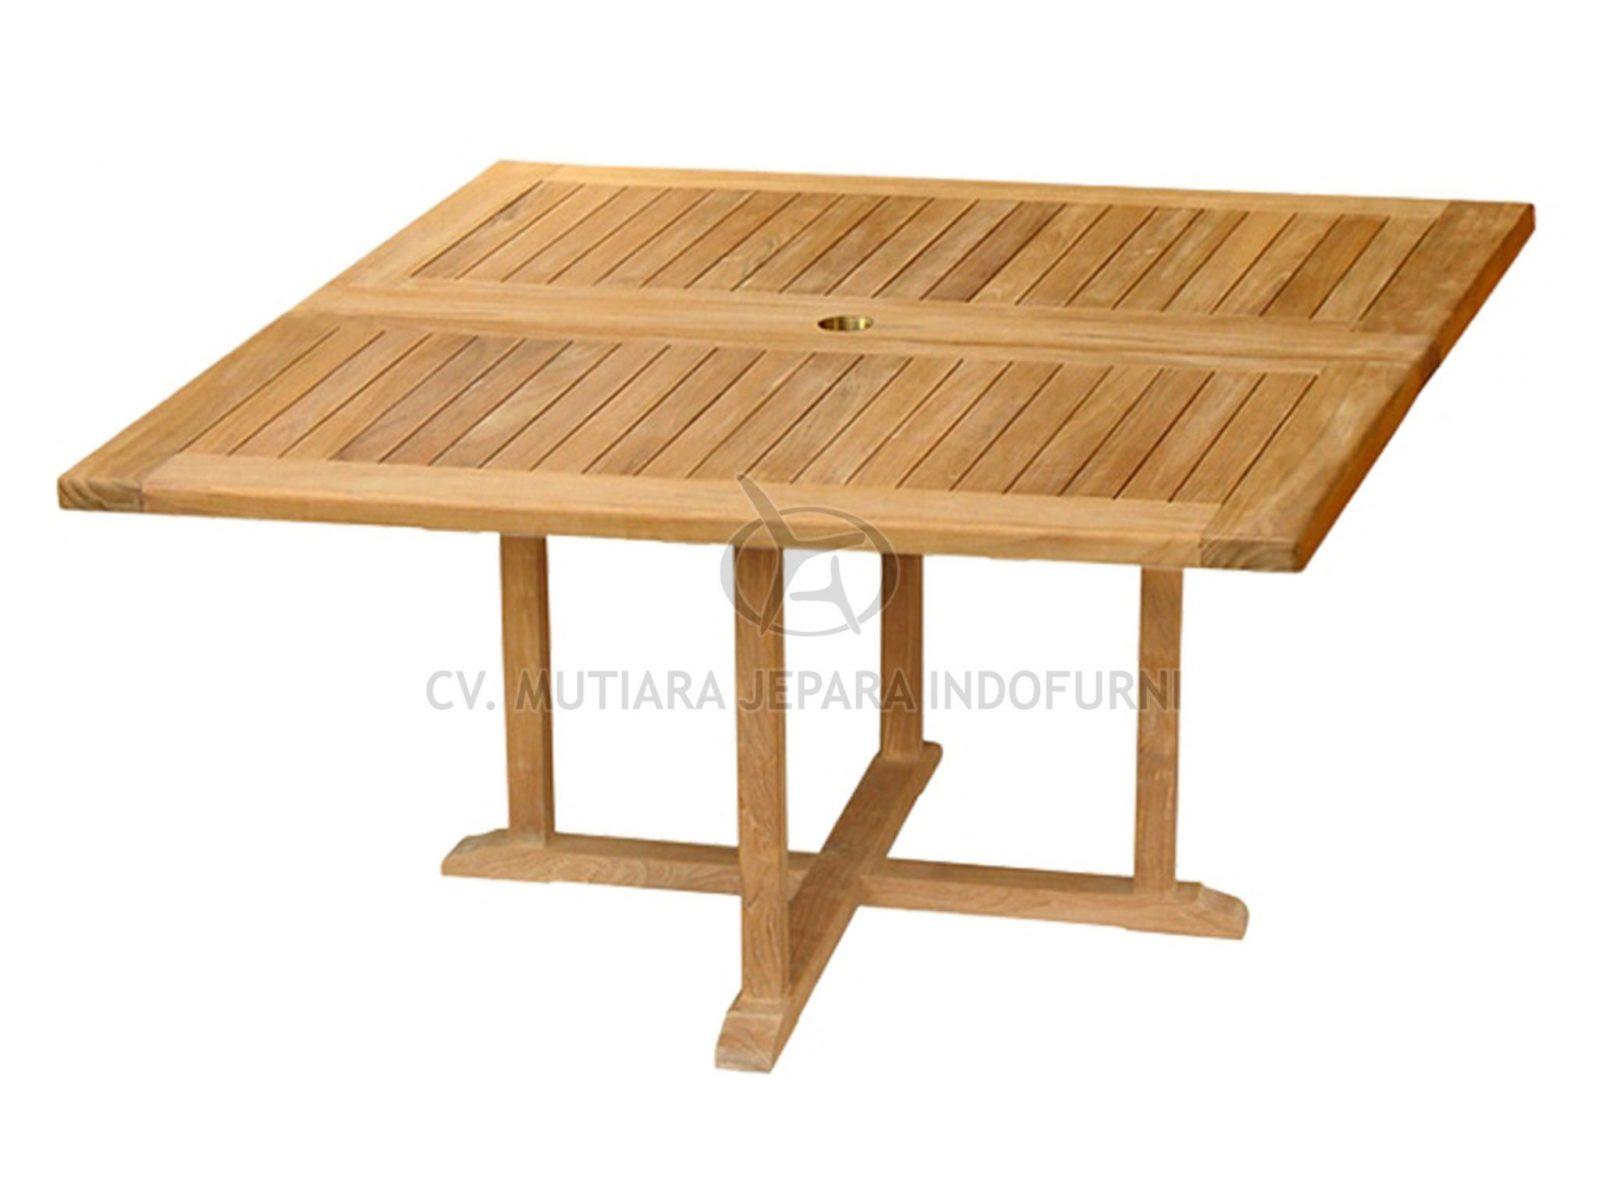 Square Fixed Table Teak Furniture Indonesia Furniture Manufacturer